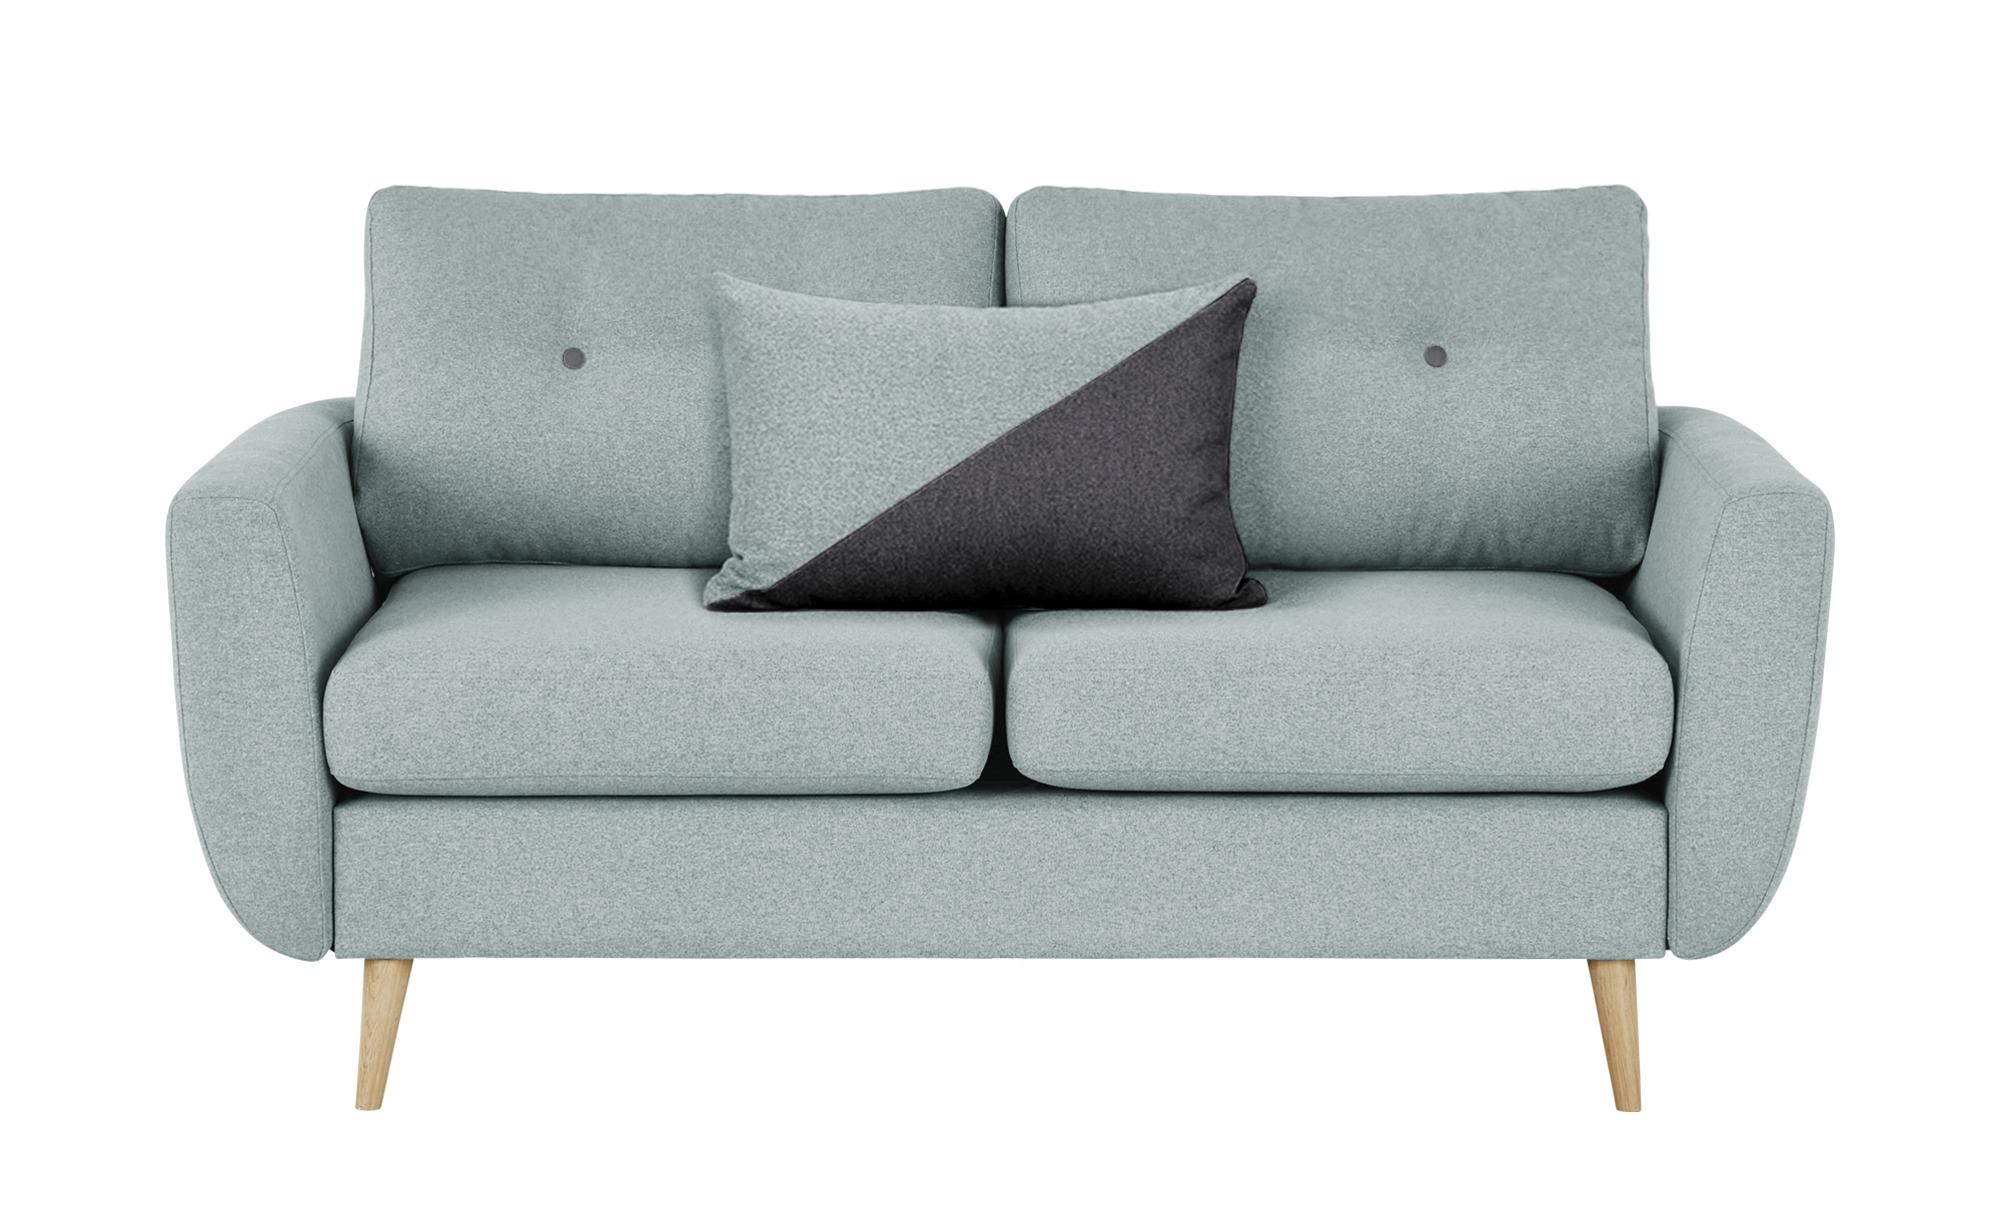 finya Sofa mintgrün - Webstoff Harris ¦ blau ¦ Maße (cm): B: 161 H: 85 T: 92 Polstermöbel > Sofas > 2-Sitzer - Höffner